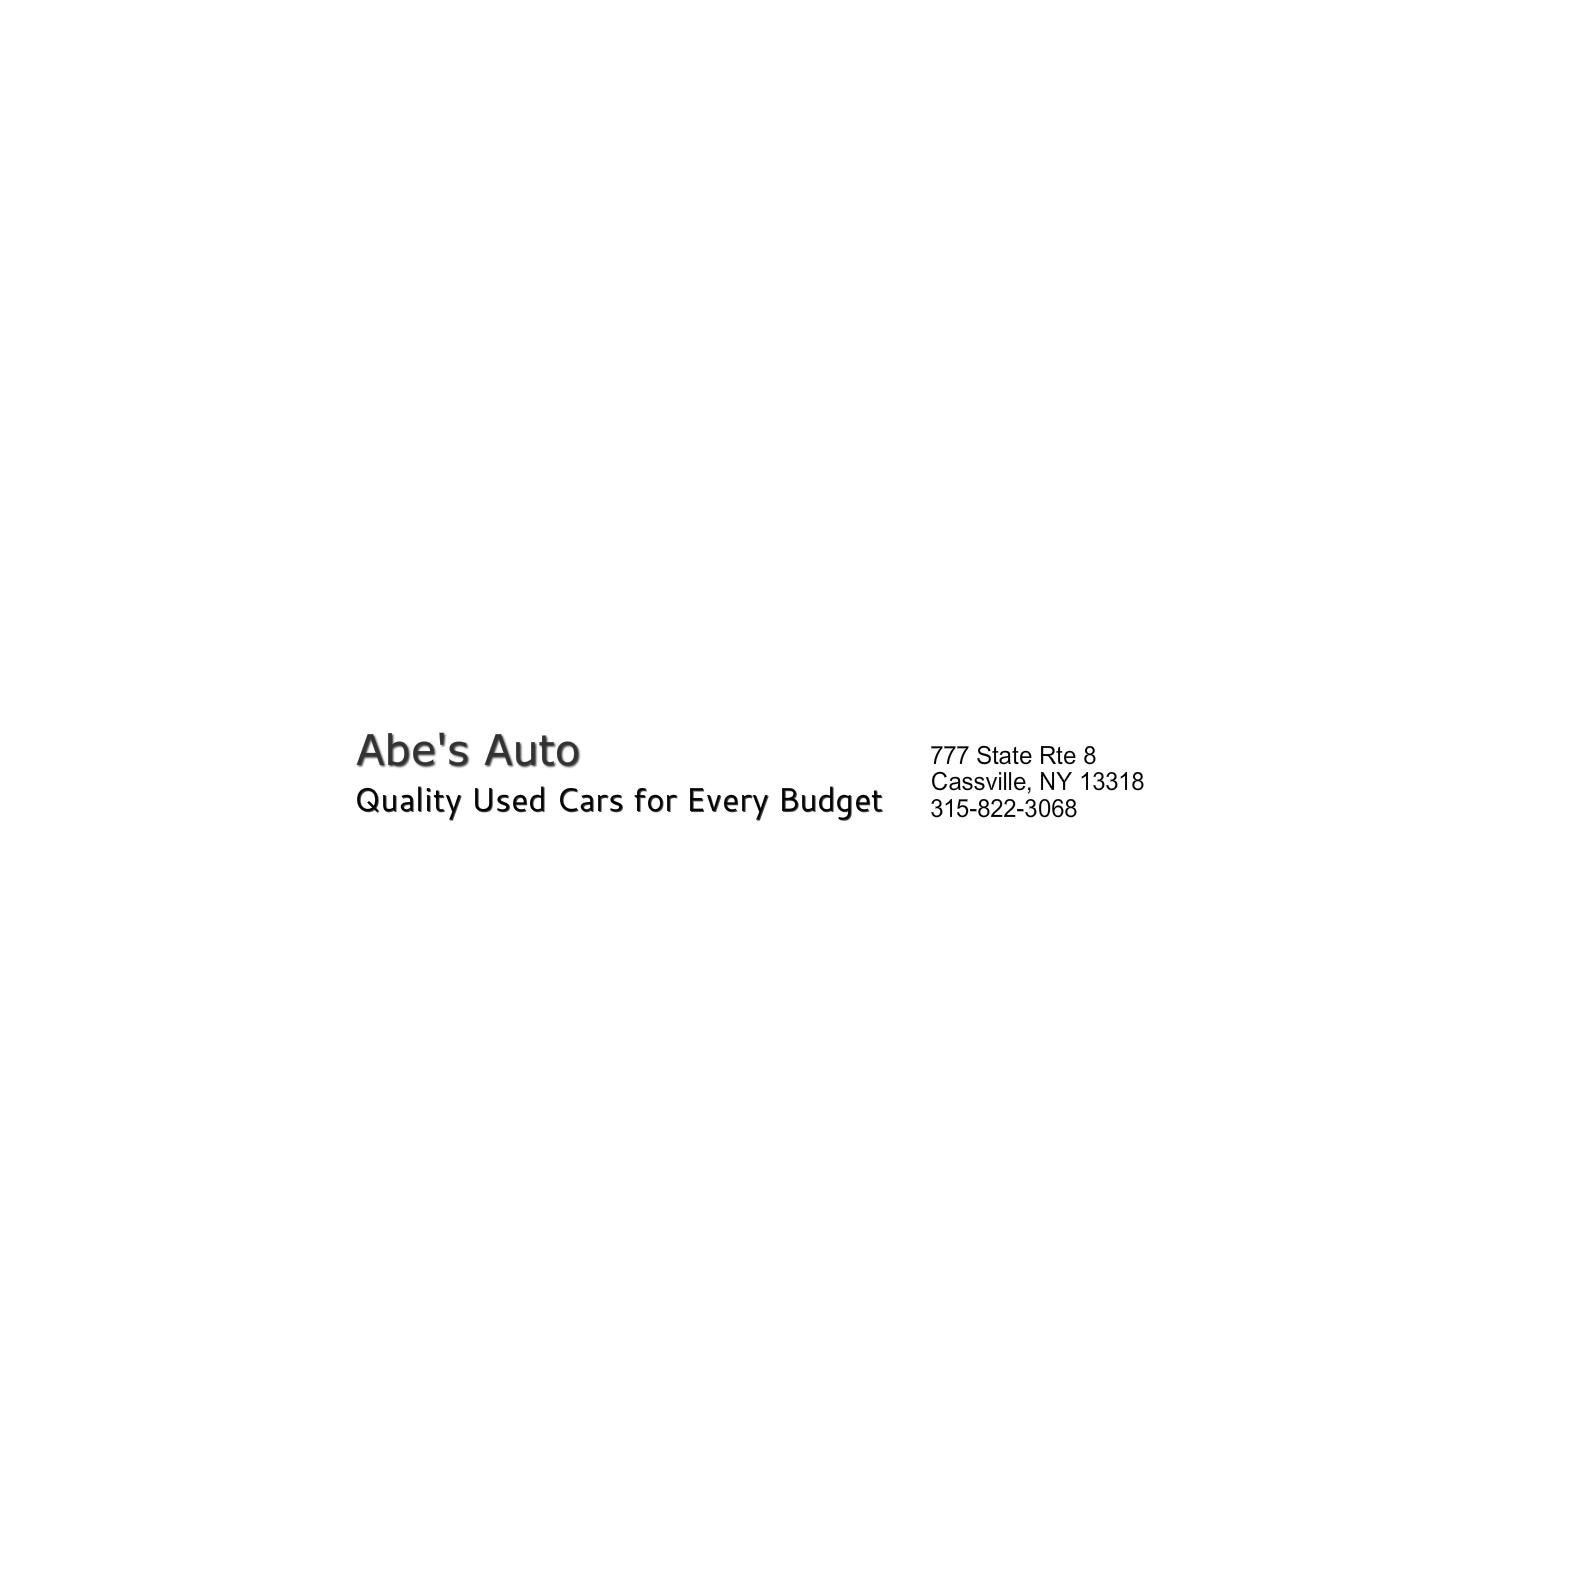 Abes Auto